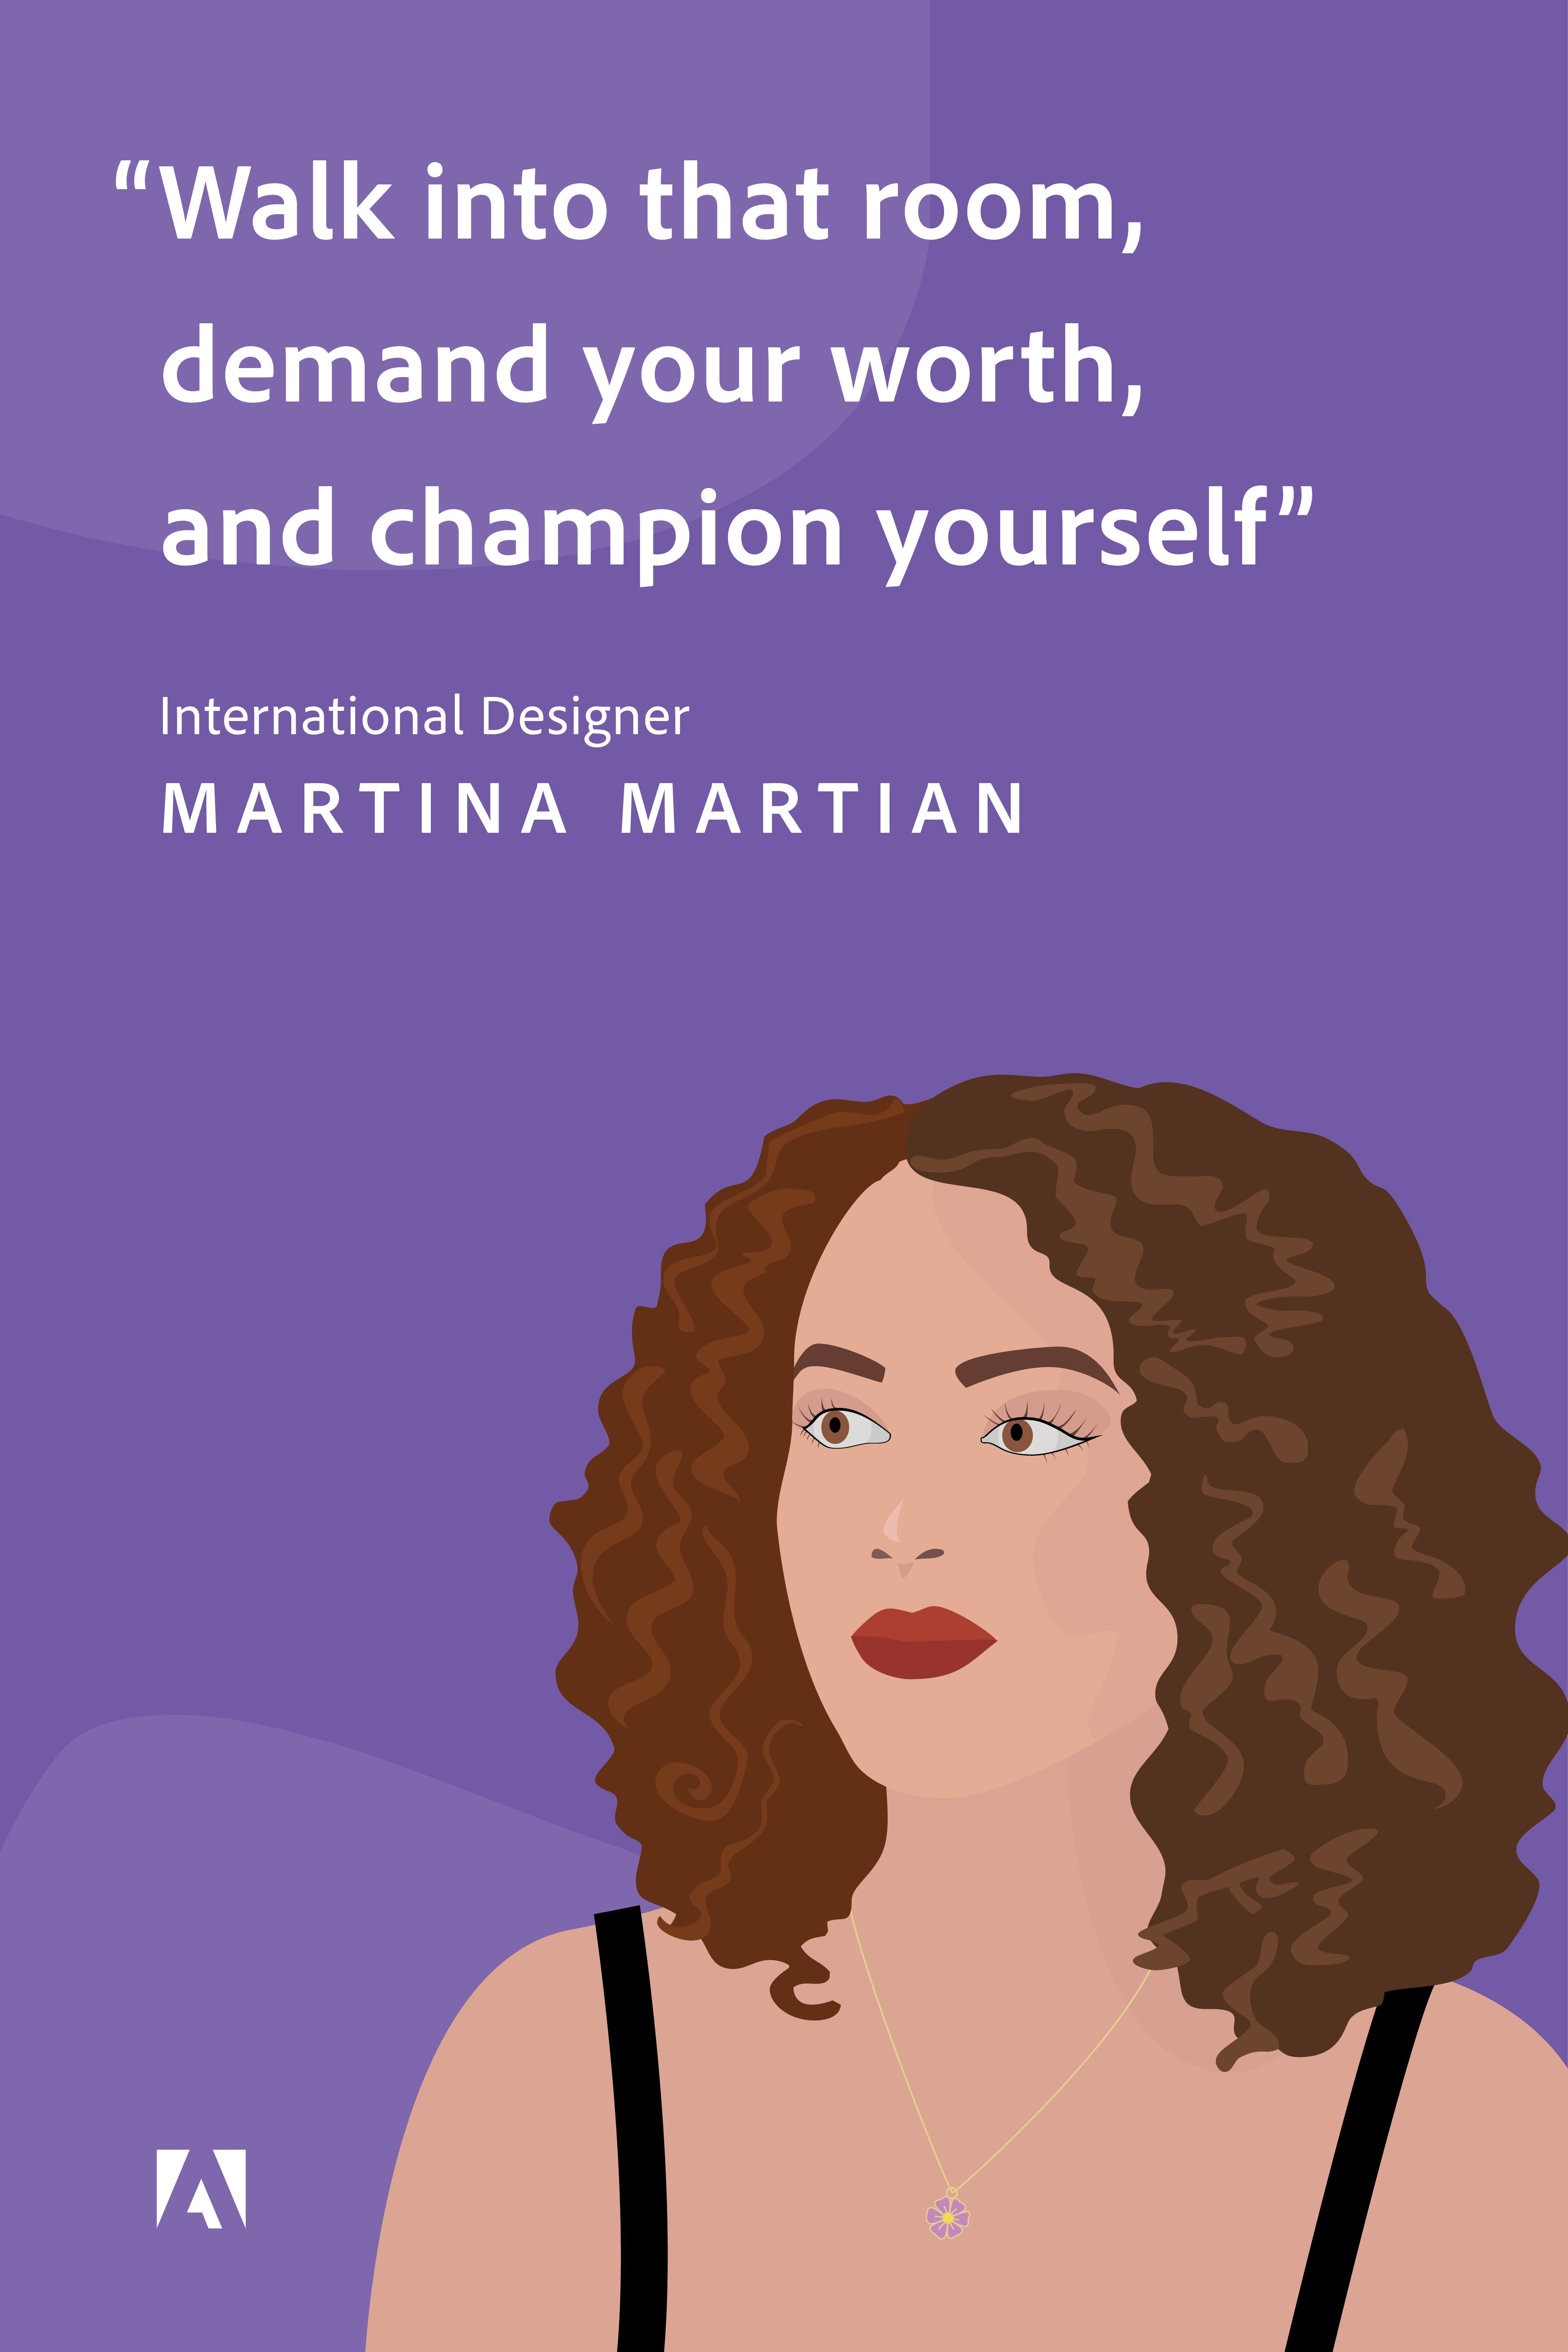 Pin By Rosie Clutten On Wise Words In 2020 Self Love Affirmations Love Affirmations Inspiration